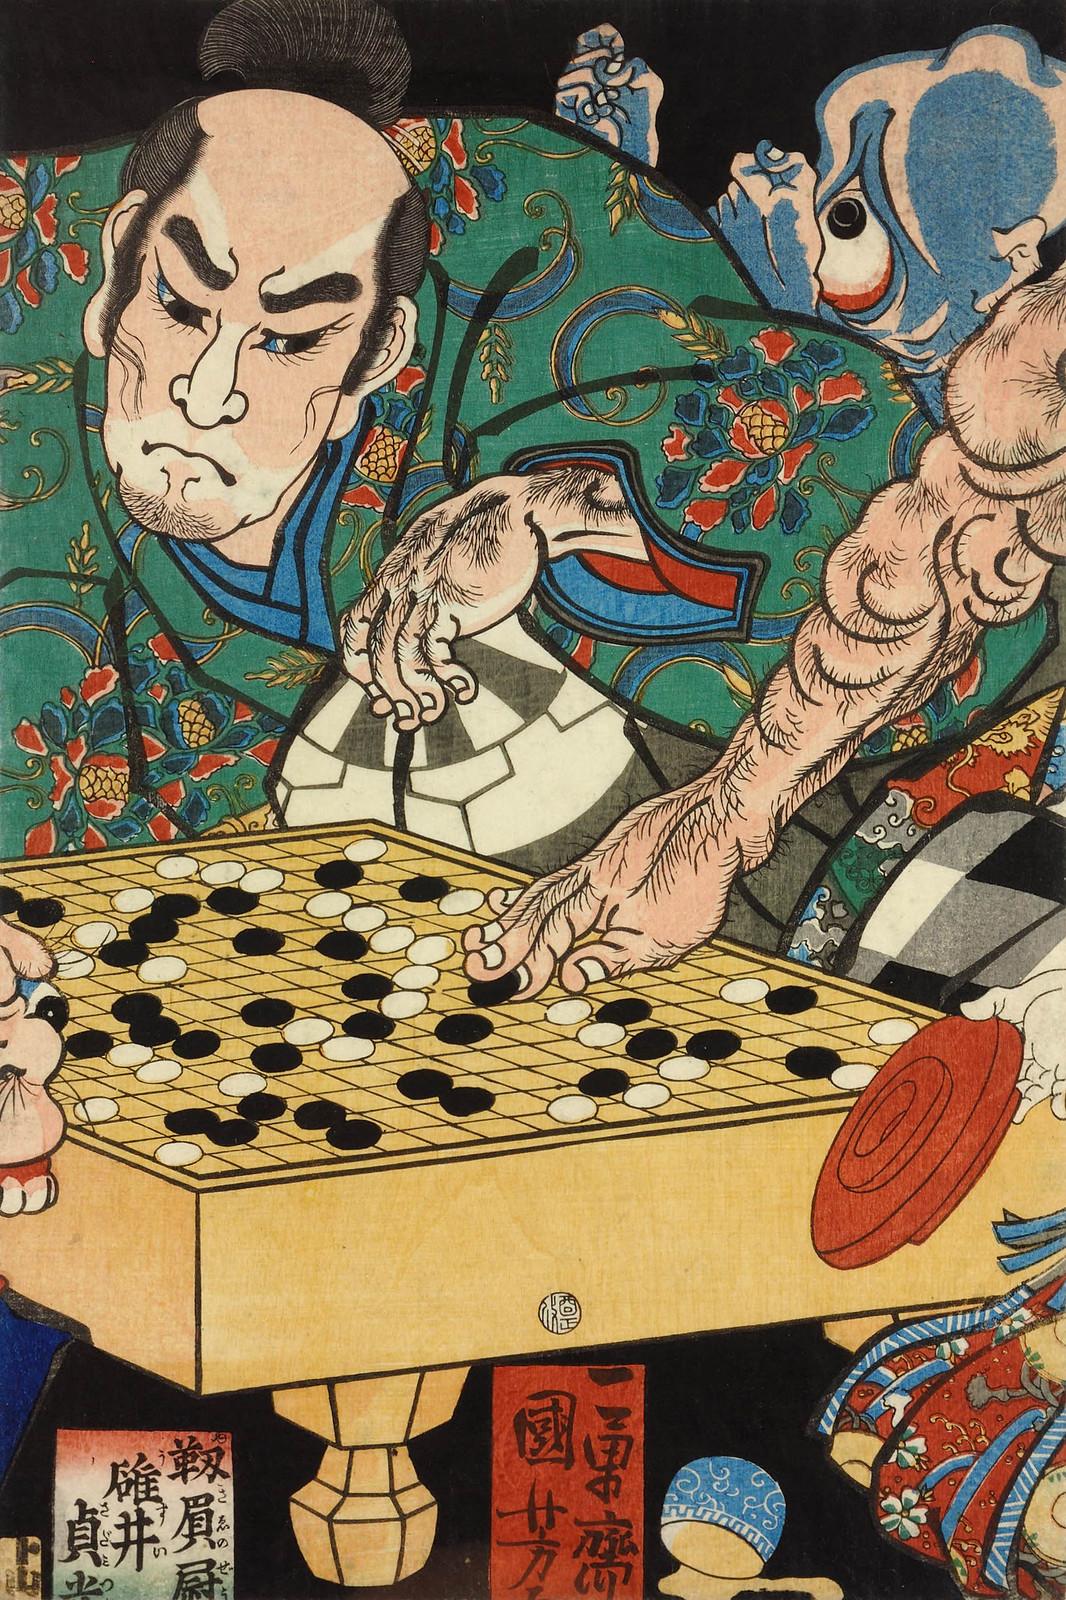 Utagawa Kuniyoshi - Raiko's retainers, Watanabe no Tonna, Sadanobu, and Kunitoki, playing go, with attempted interruptions by the Earth-Spider's demons. Edo Period (middle panel)